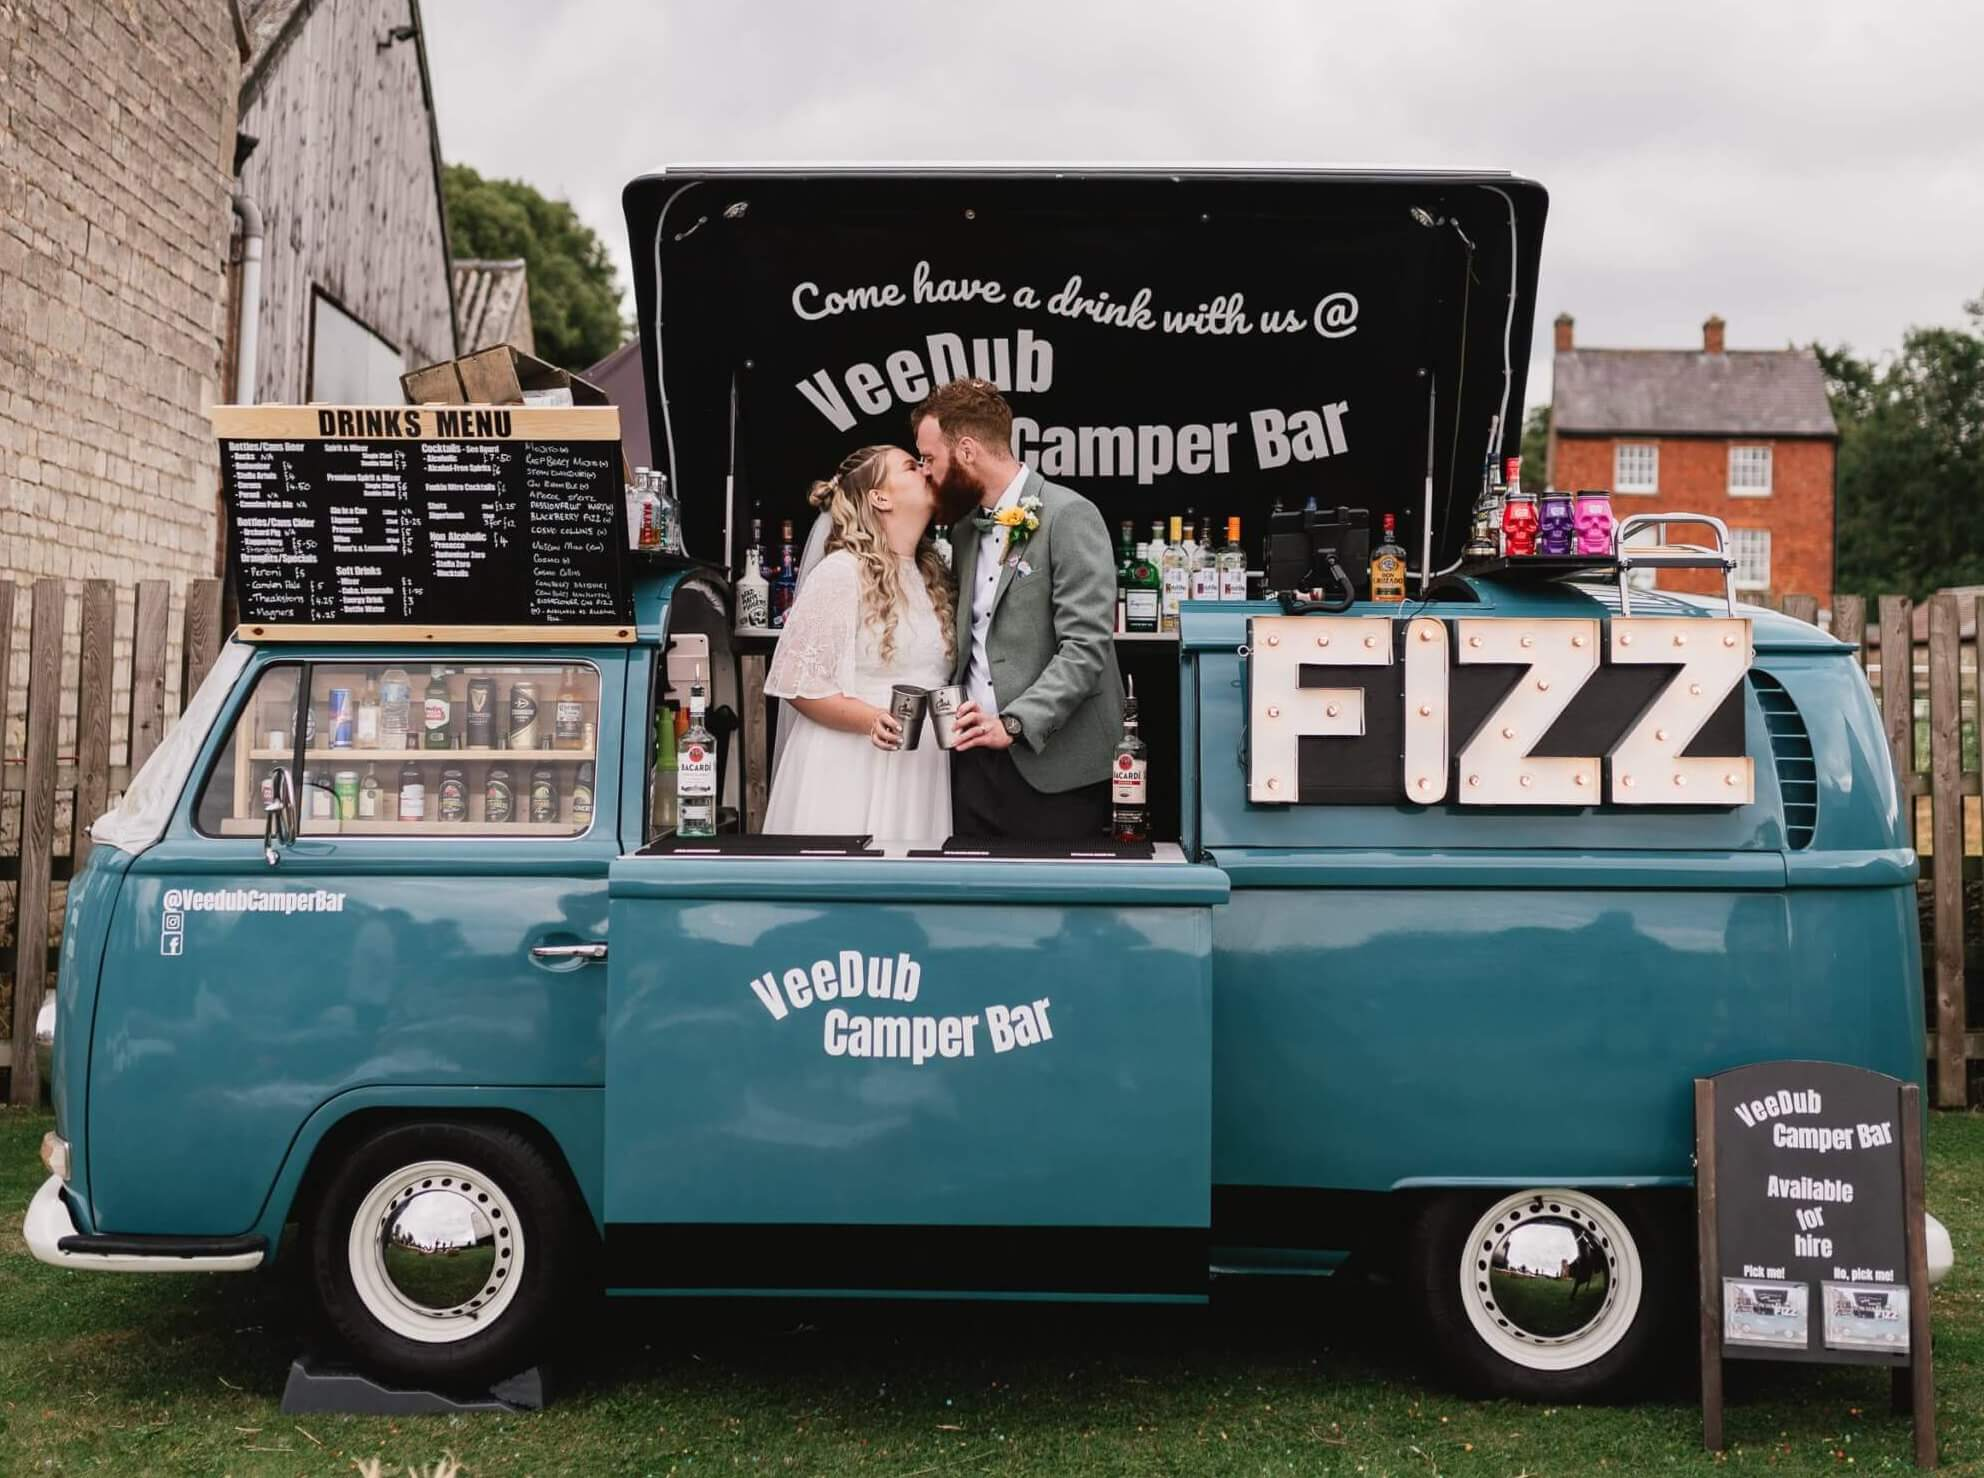 Weddings - Tippee - Tipee - Festival Style Weddings